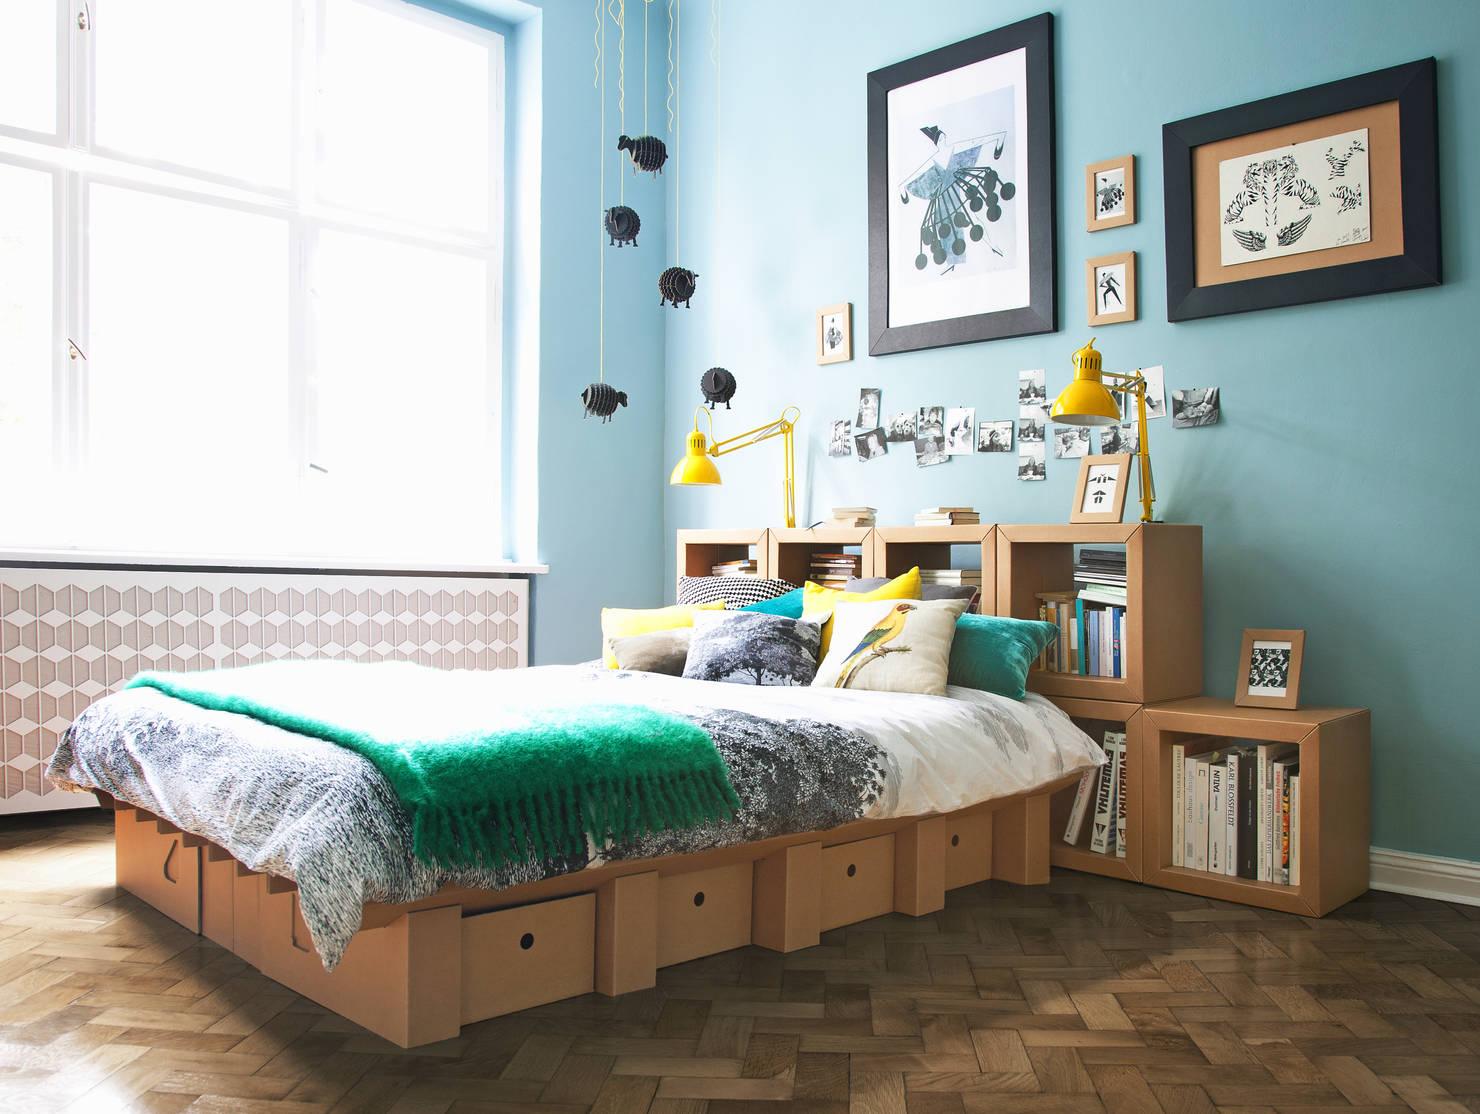 Woodworking: 6 simple DIY bed frames